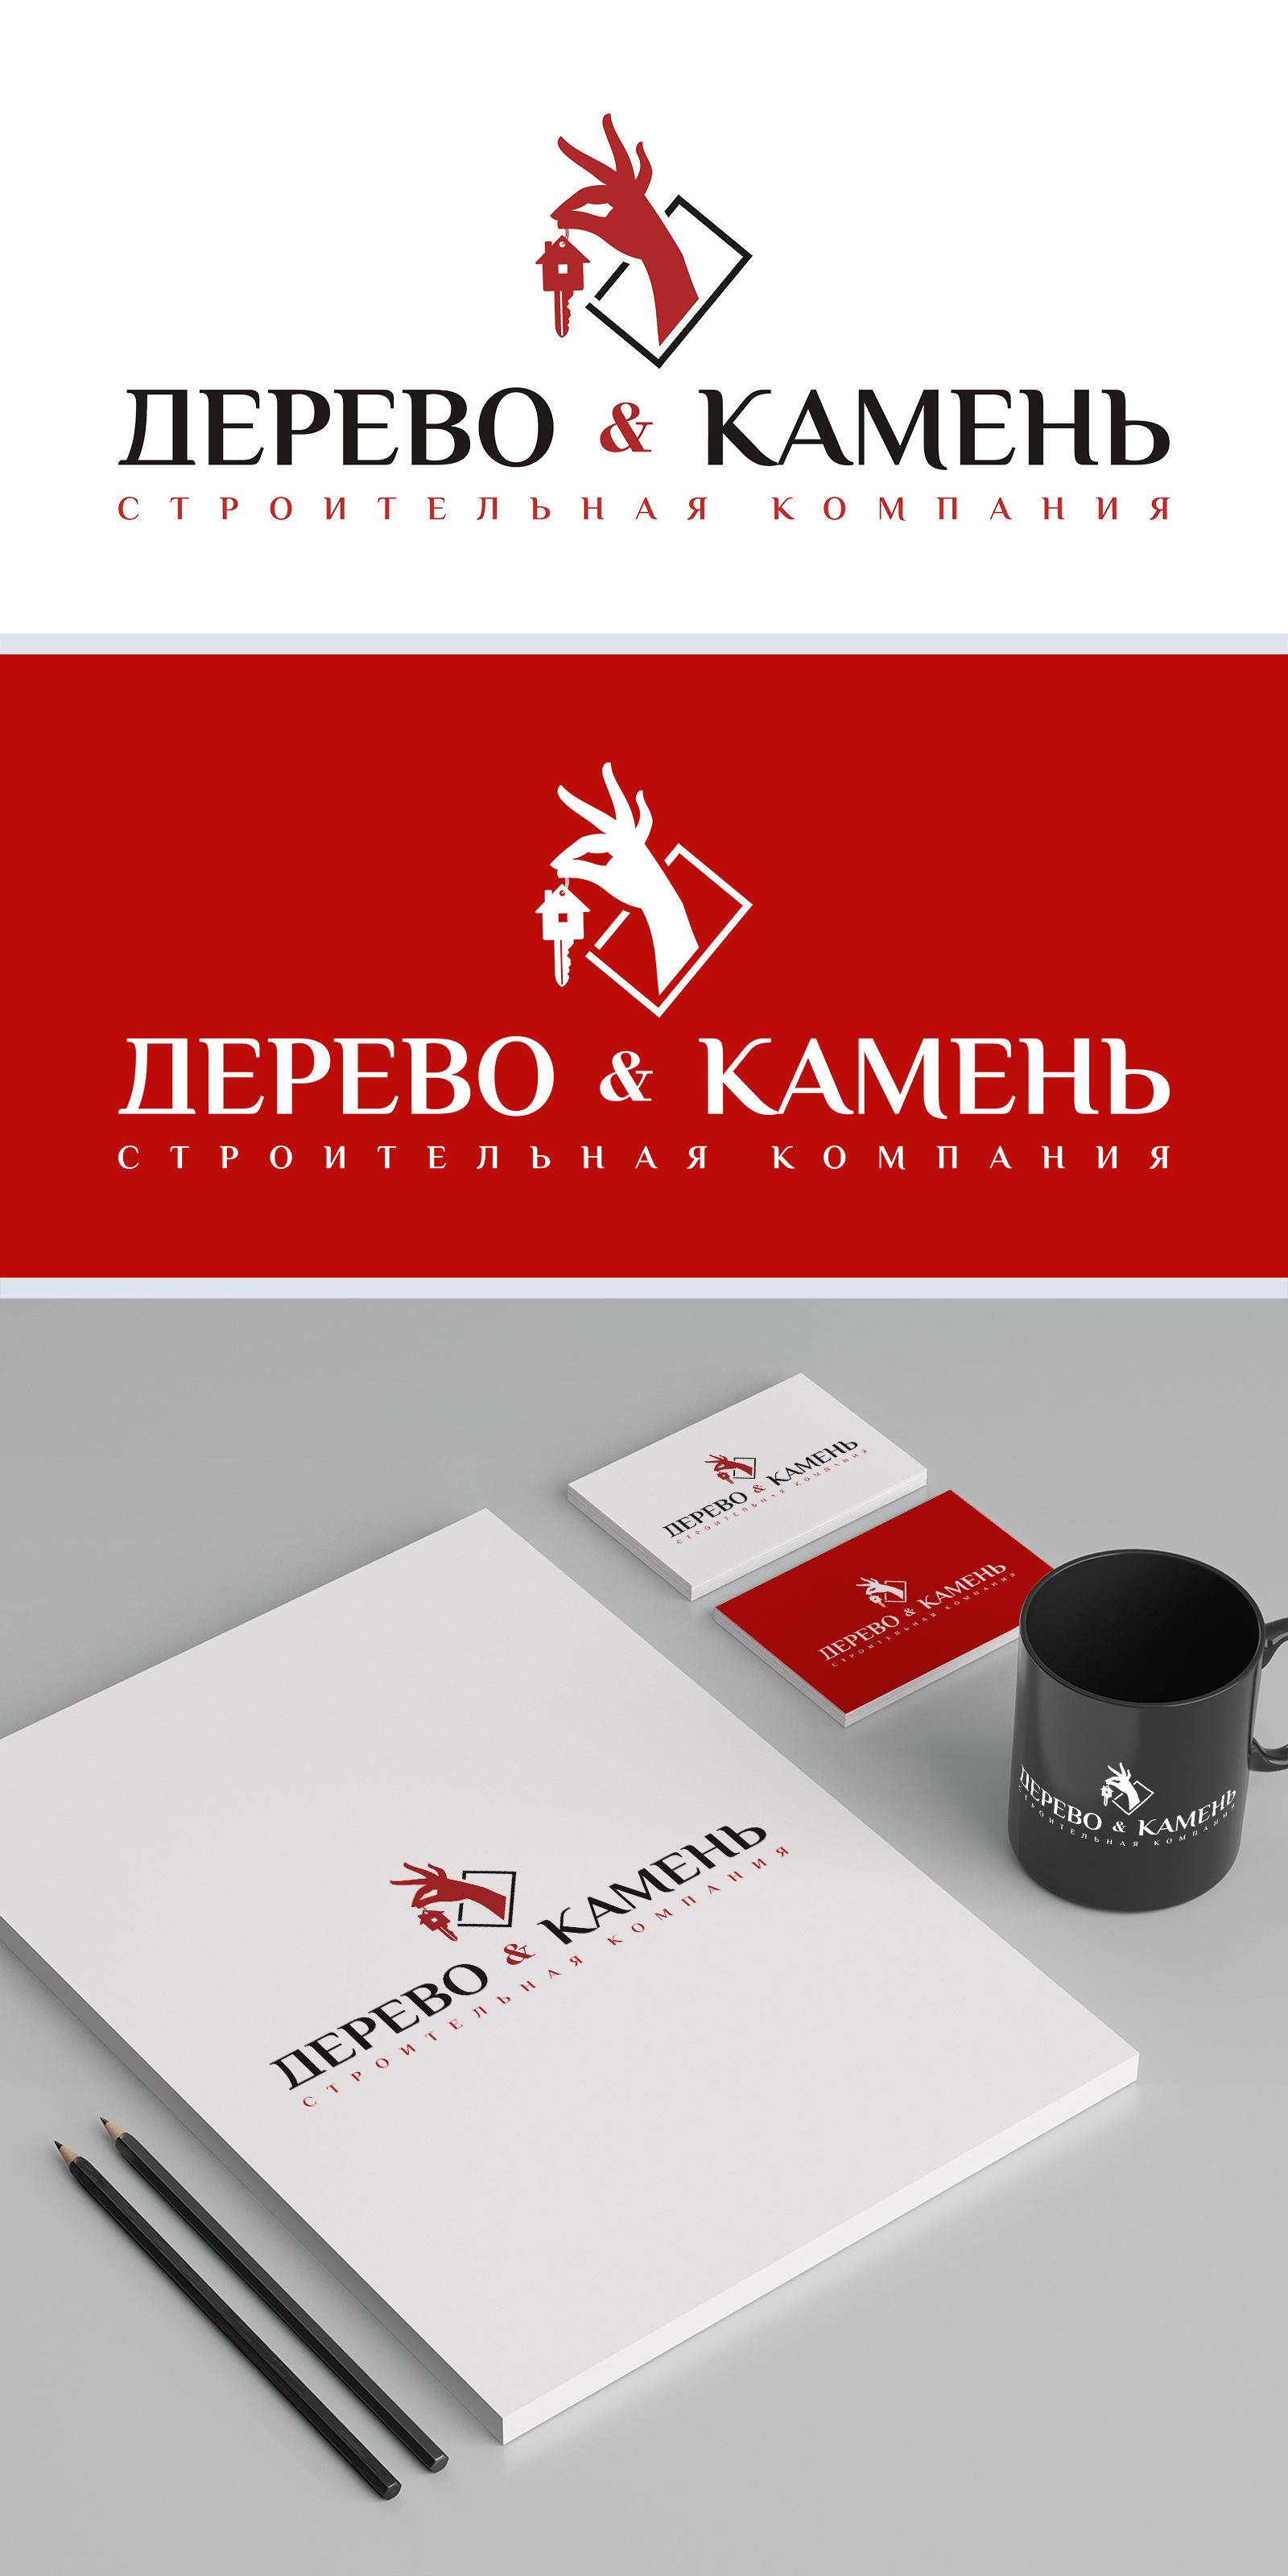 Логотип и Фирменный стиль фото f_14954a7c0cea8114.jpg